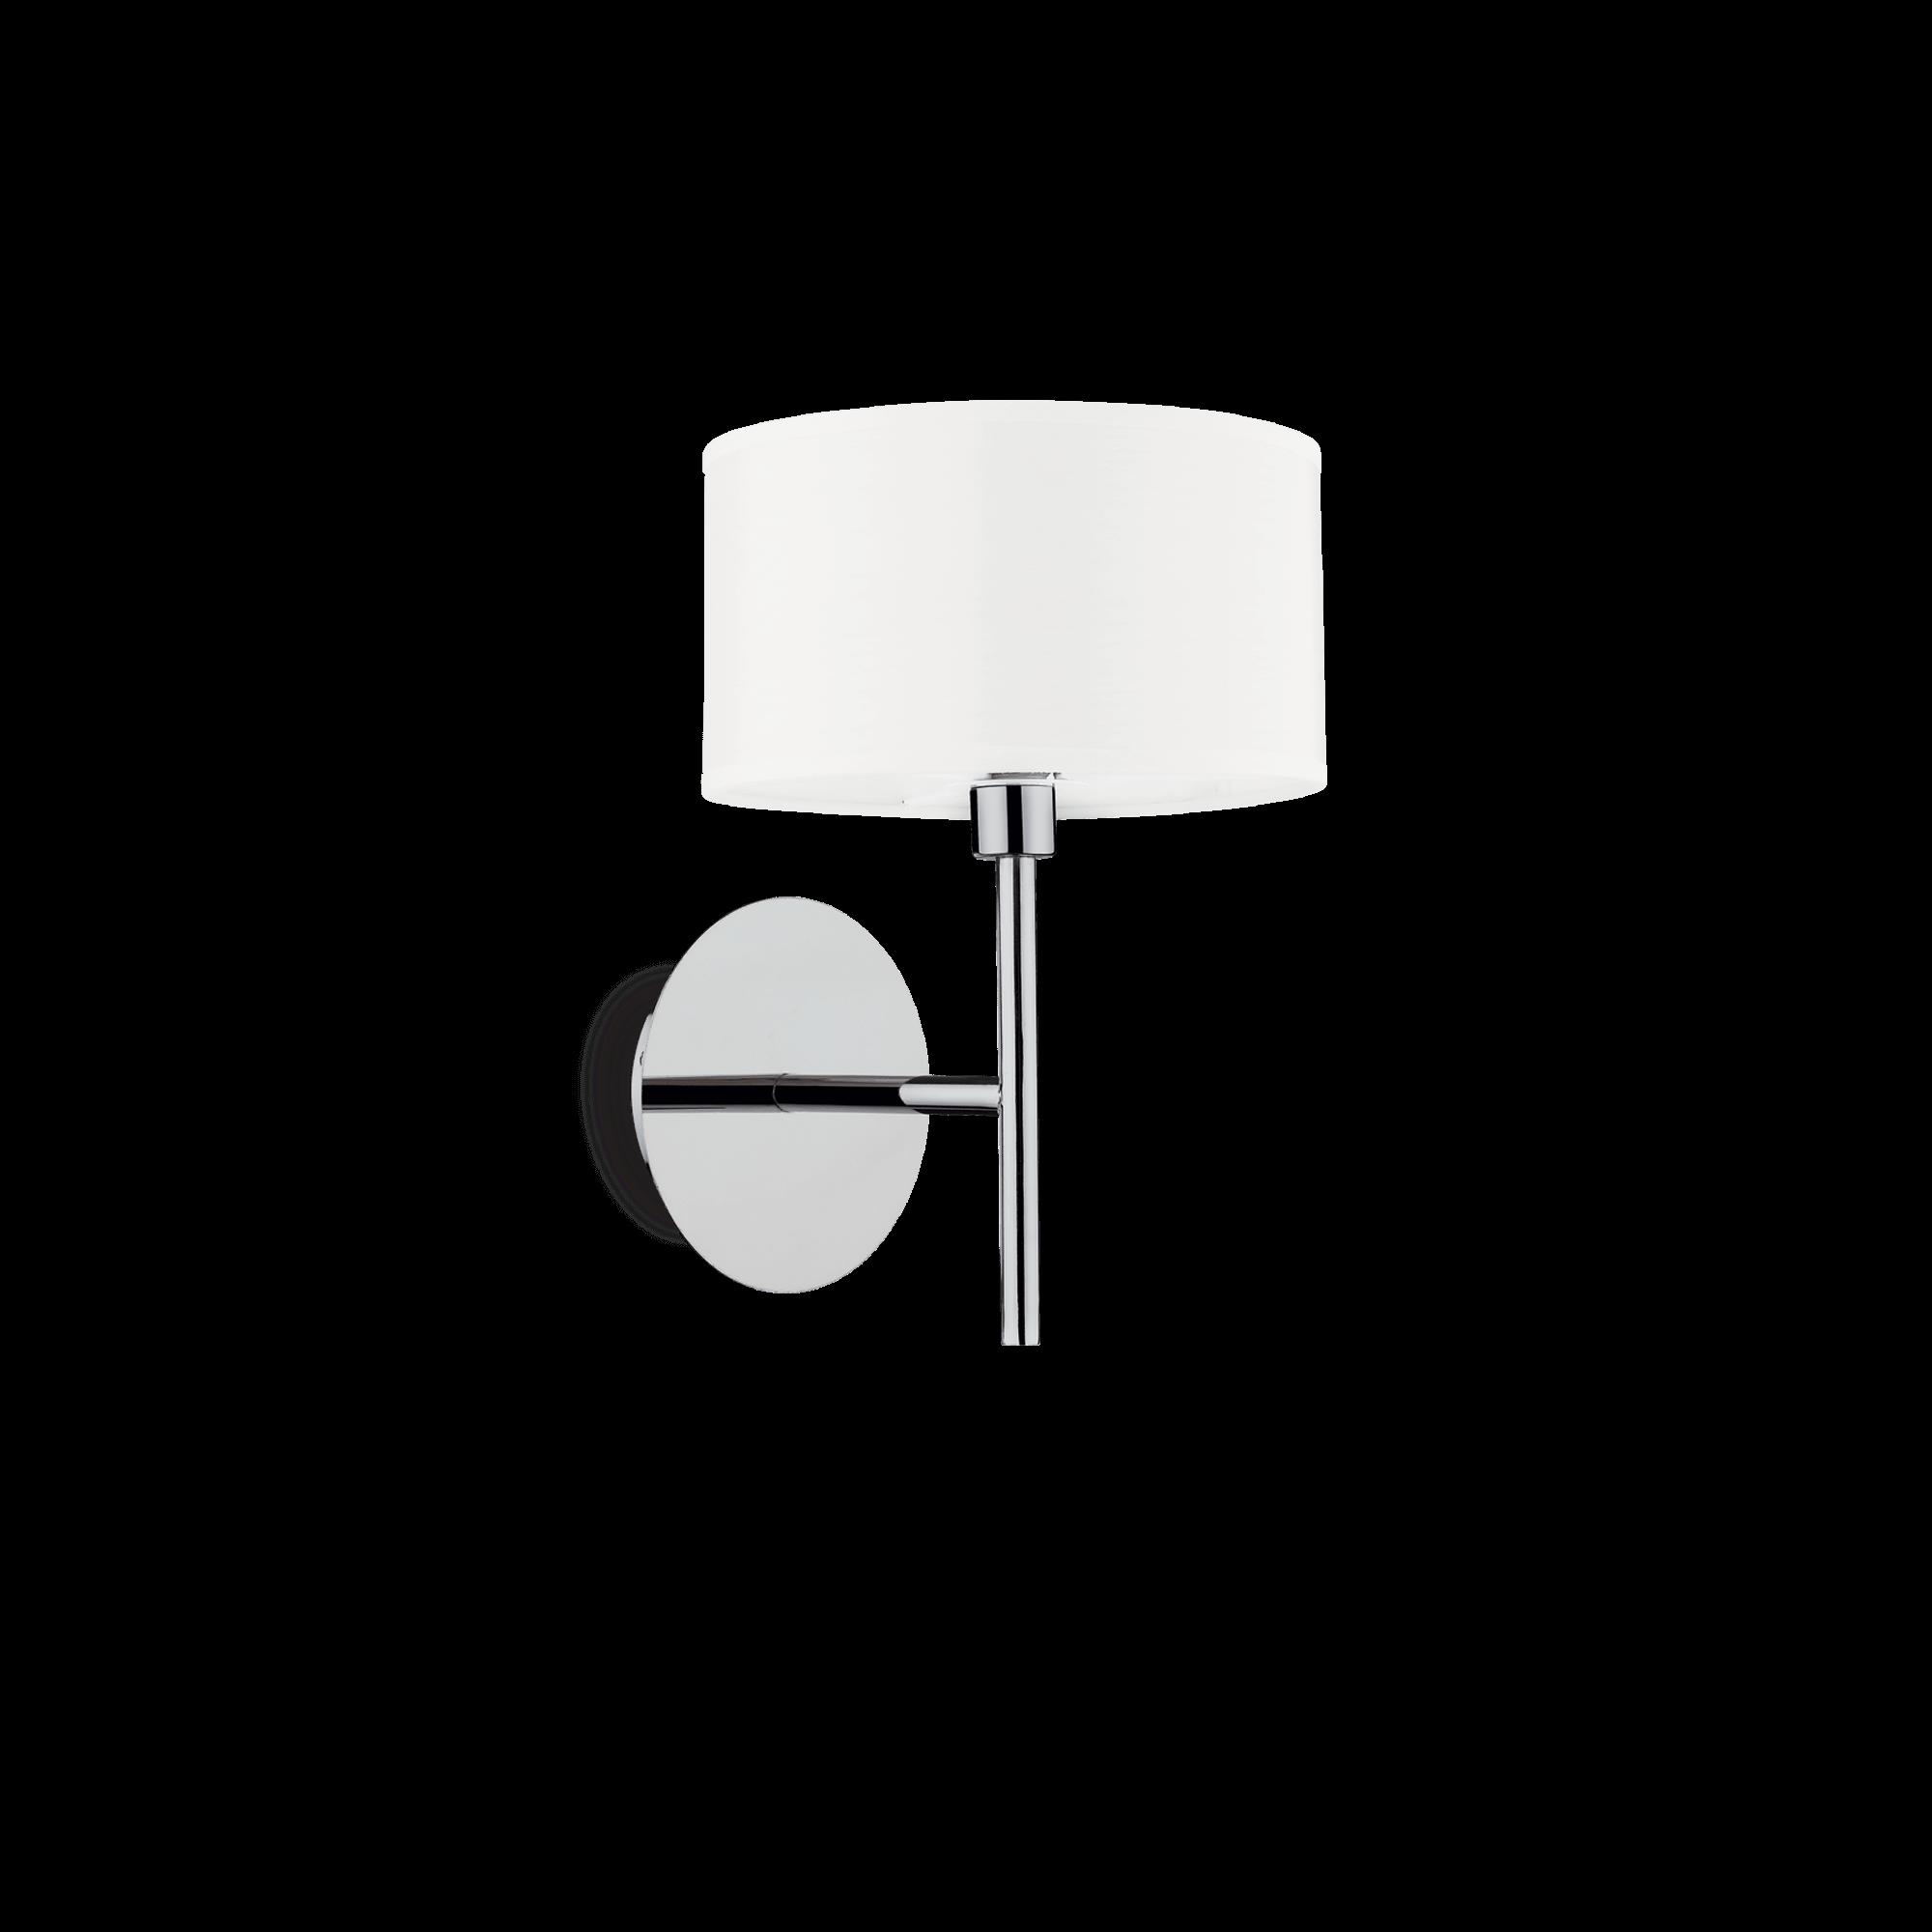 Ideal Lux 143156 WOODY AP1 BIANCO falilámpa